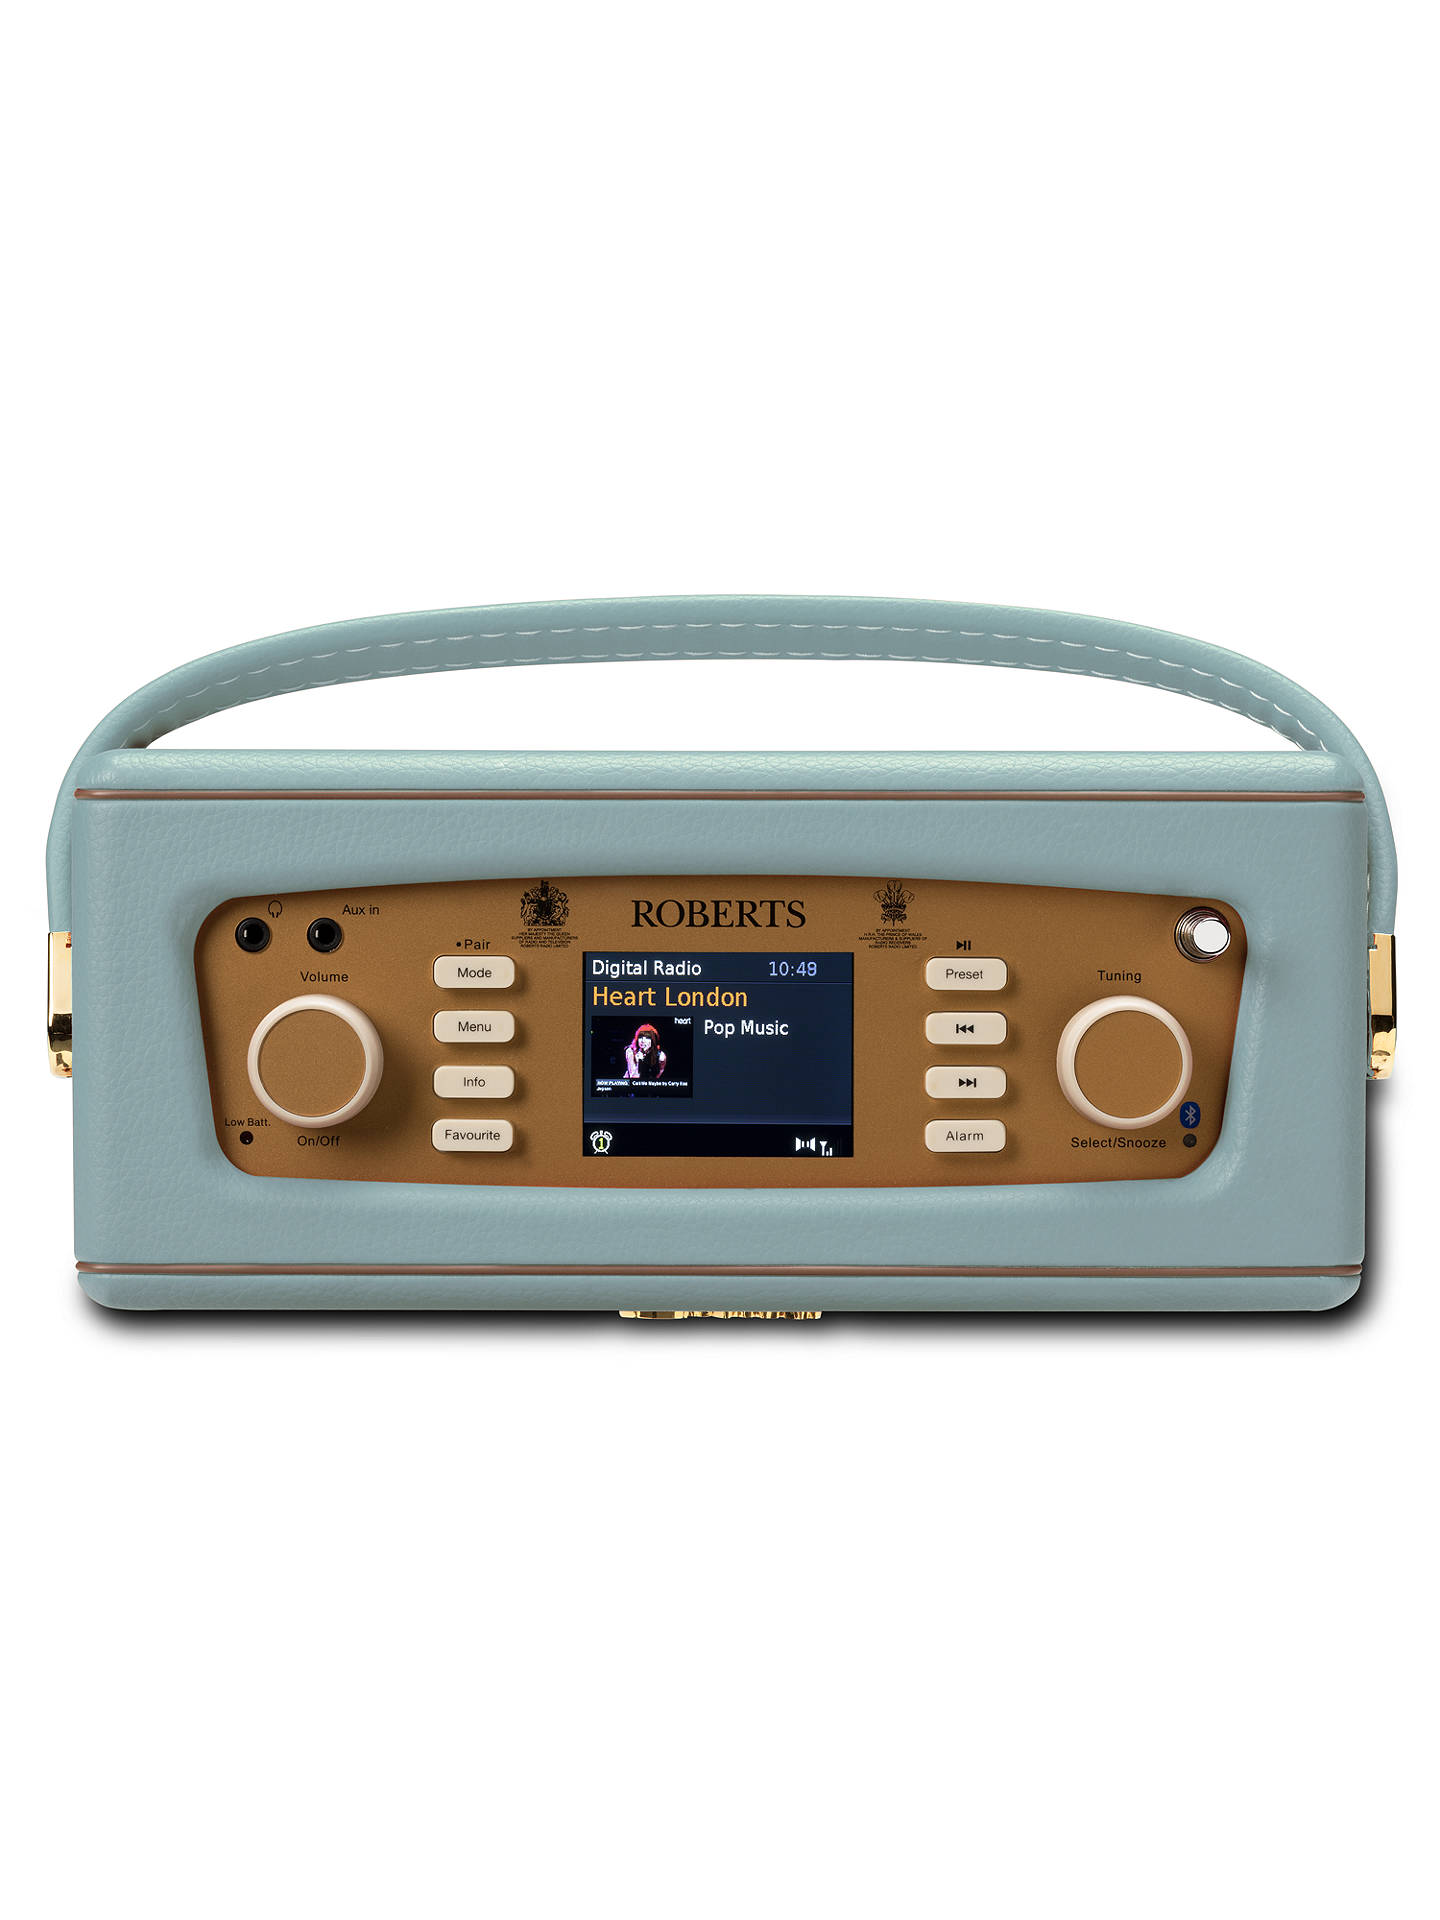 4a81562cfd5 ROBERTS Revival RD70 DAB/DAB+/FM Bluetooth Digital Radio with Alarm, Duck  Egg